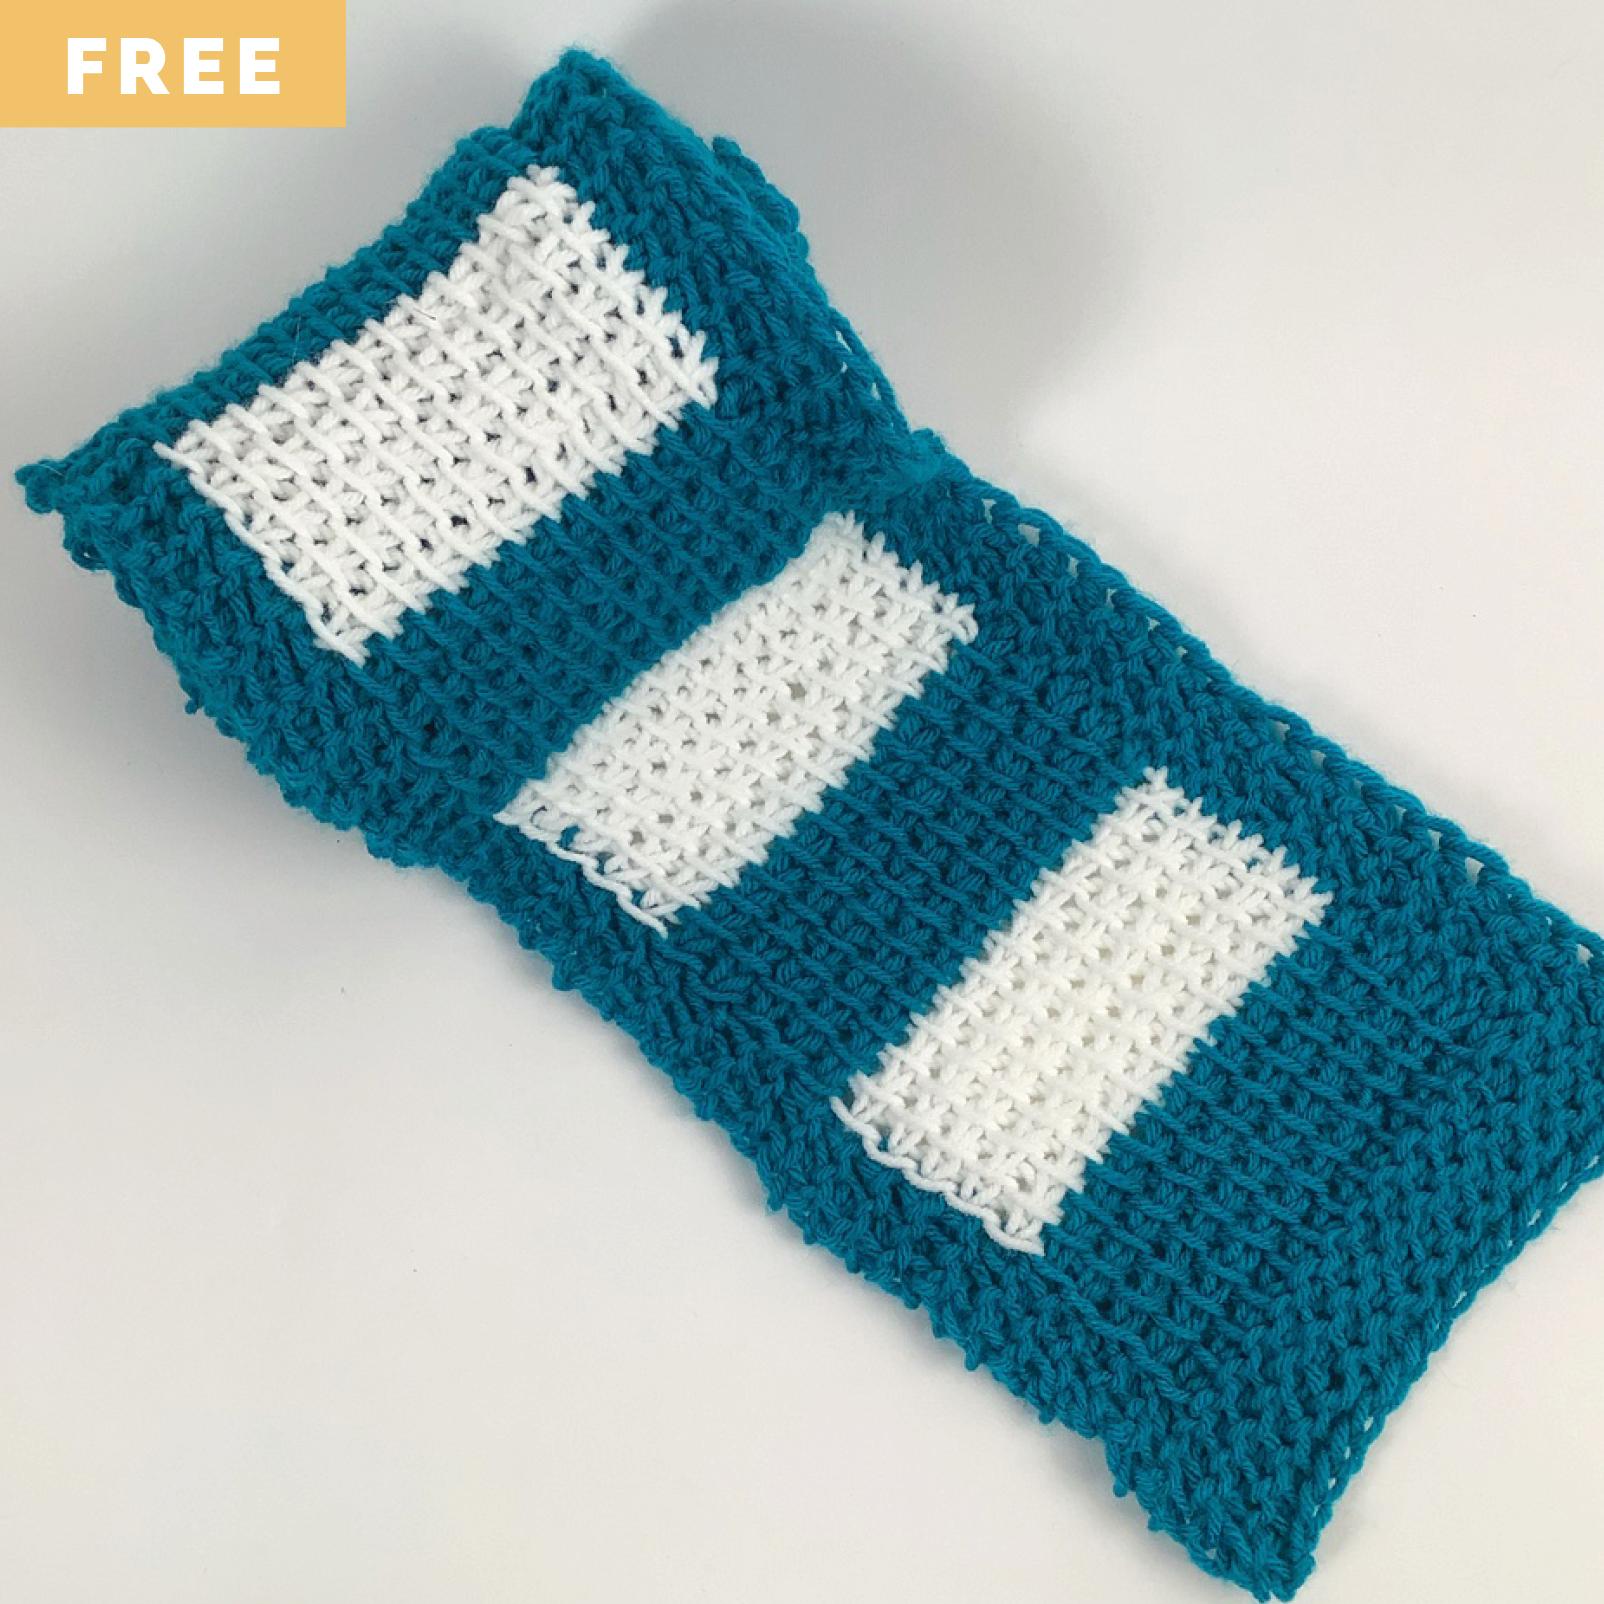 Free Crochet Pattern - Striped Tunisian Scarf